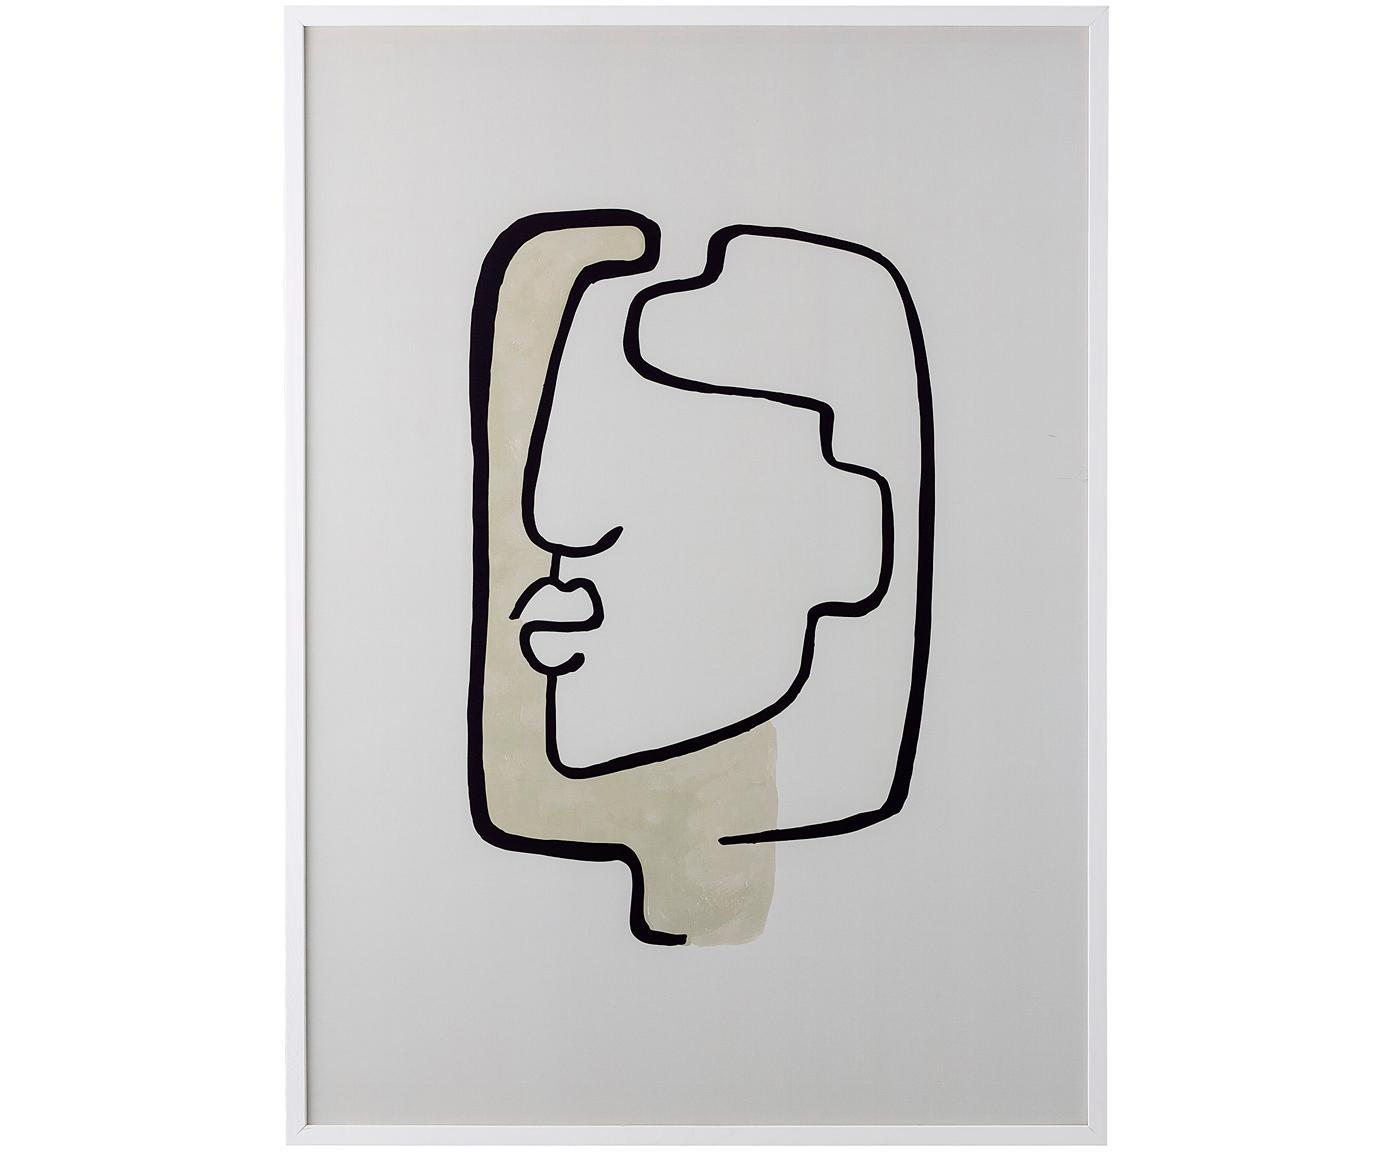 Ingelijste digitale print Tessa, Lijst: hout, Beige, wit, zwart, 52 x 72 cm